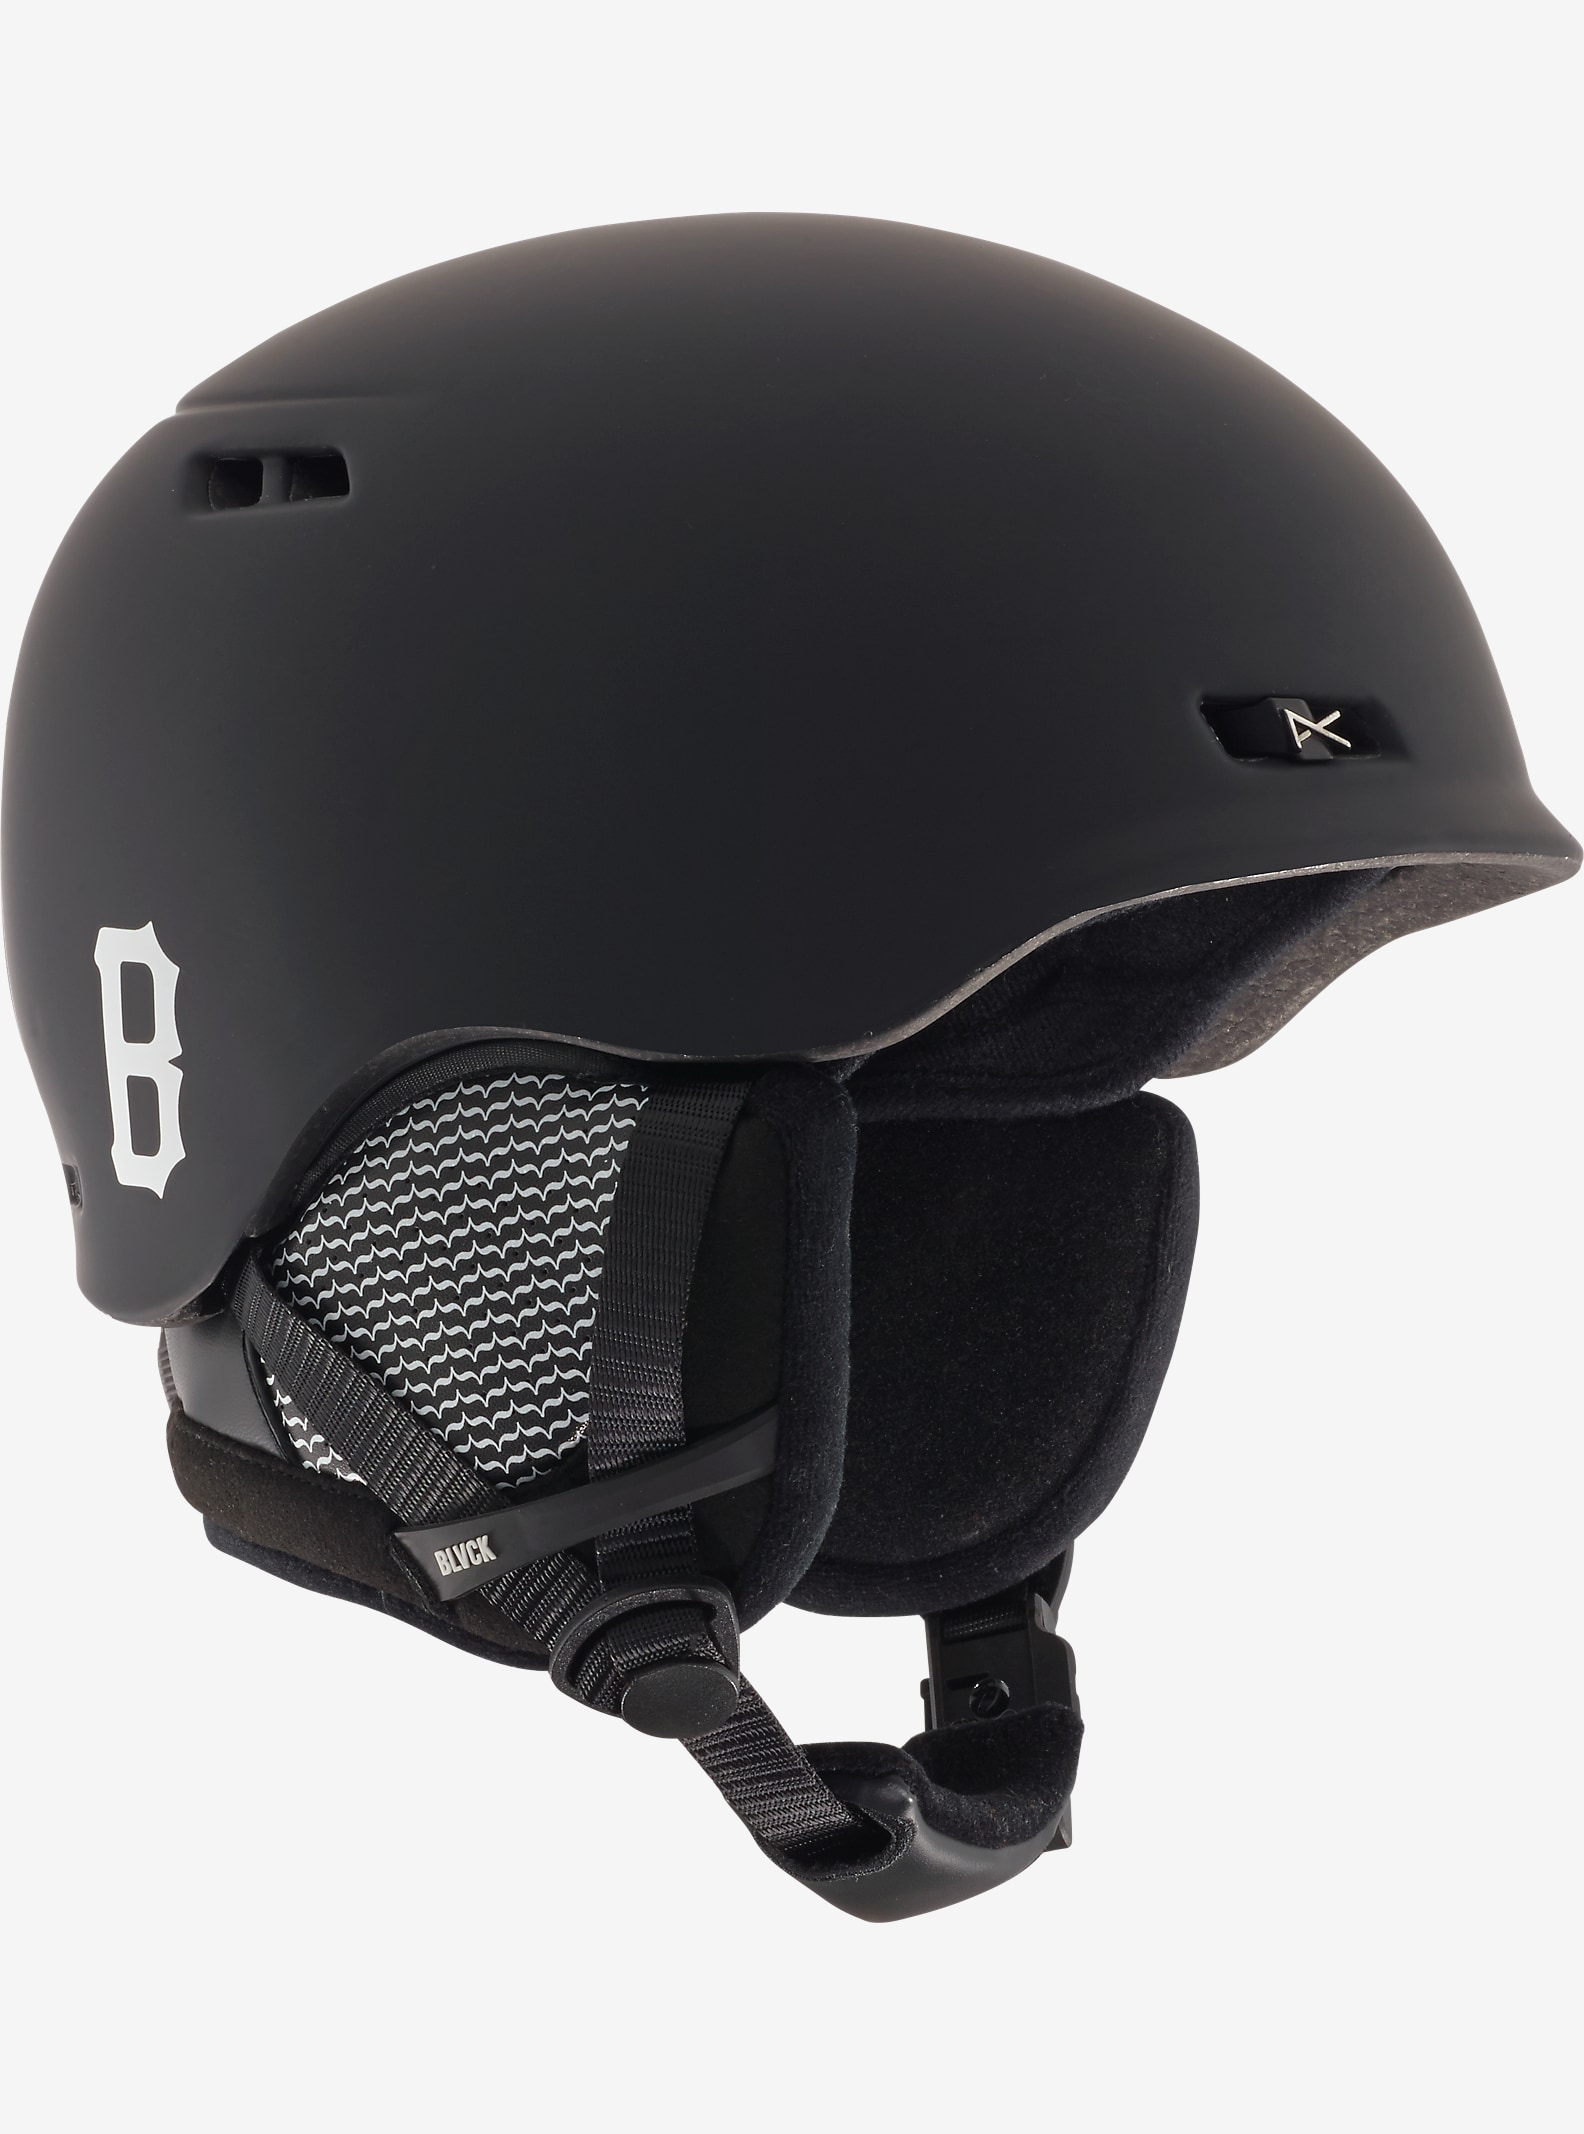 Black Scale x anon. Rodan Helmet shown in Black Scale